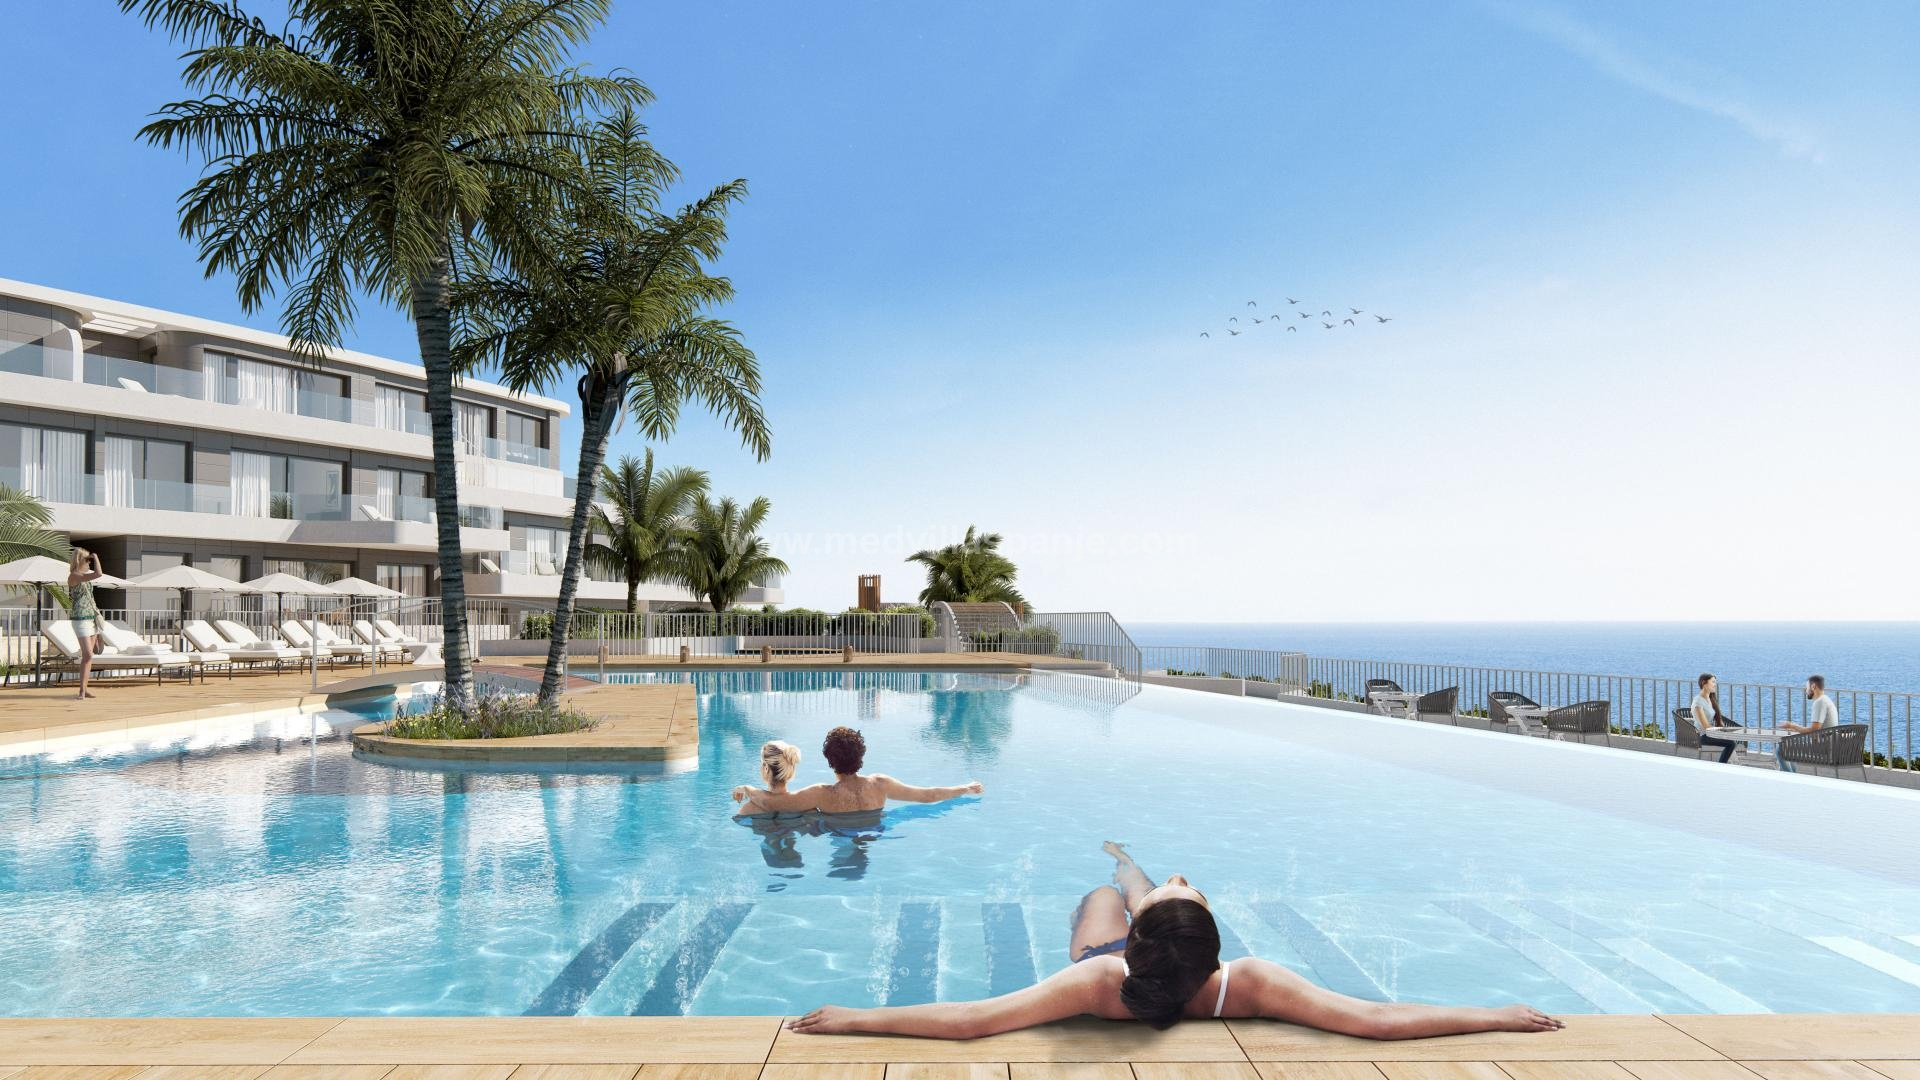 3 Bedroom Apartment in Aguilas, Costa Cálida in Medvilla Spanje